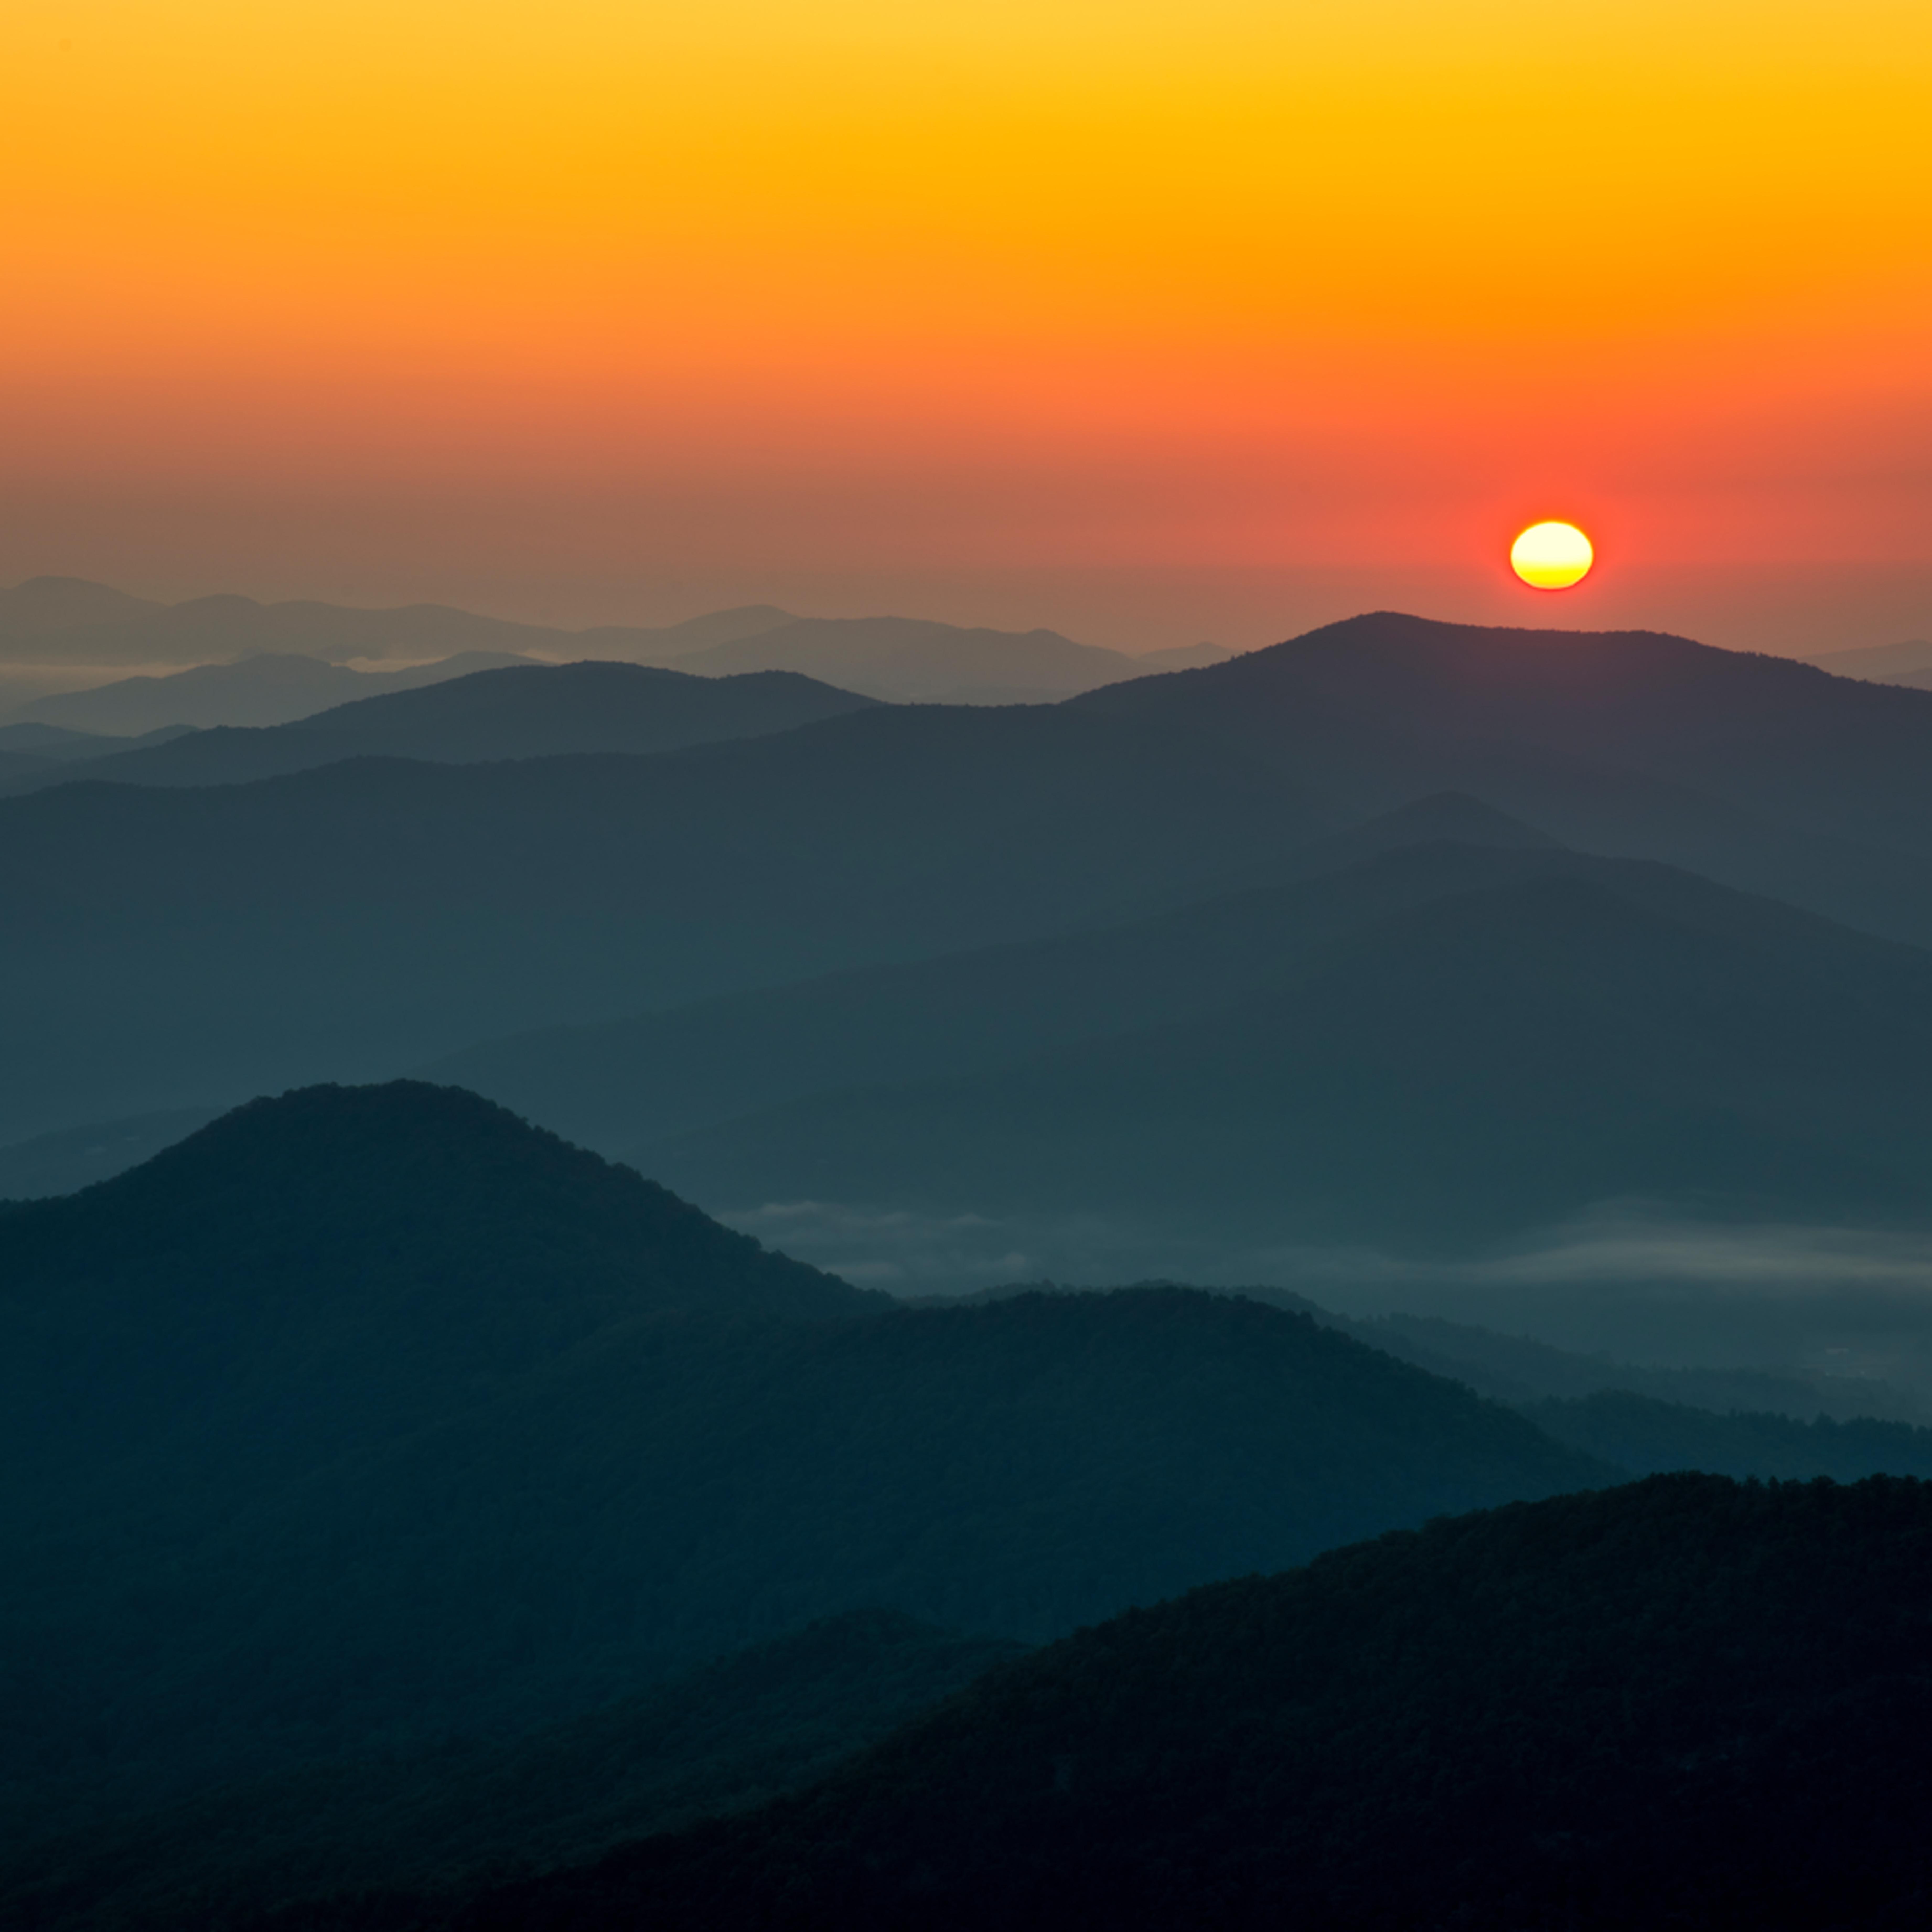 Andy crawford photography brasstown bald sunrise 001 zp2xfu